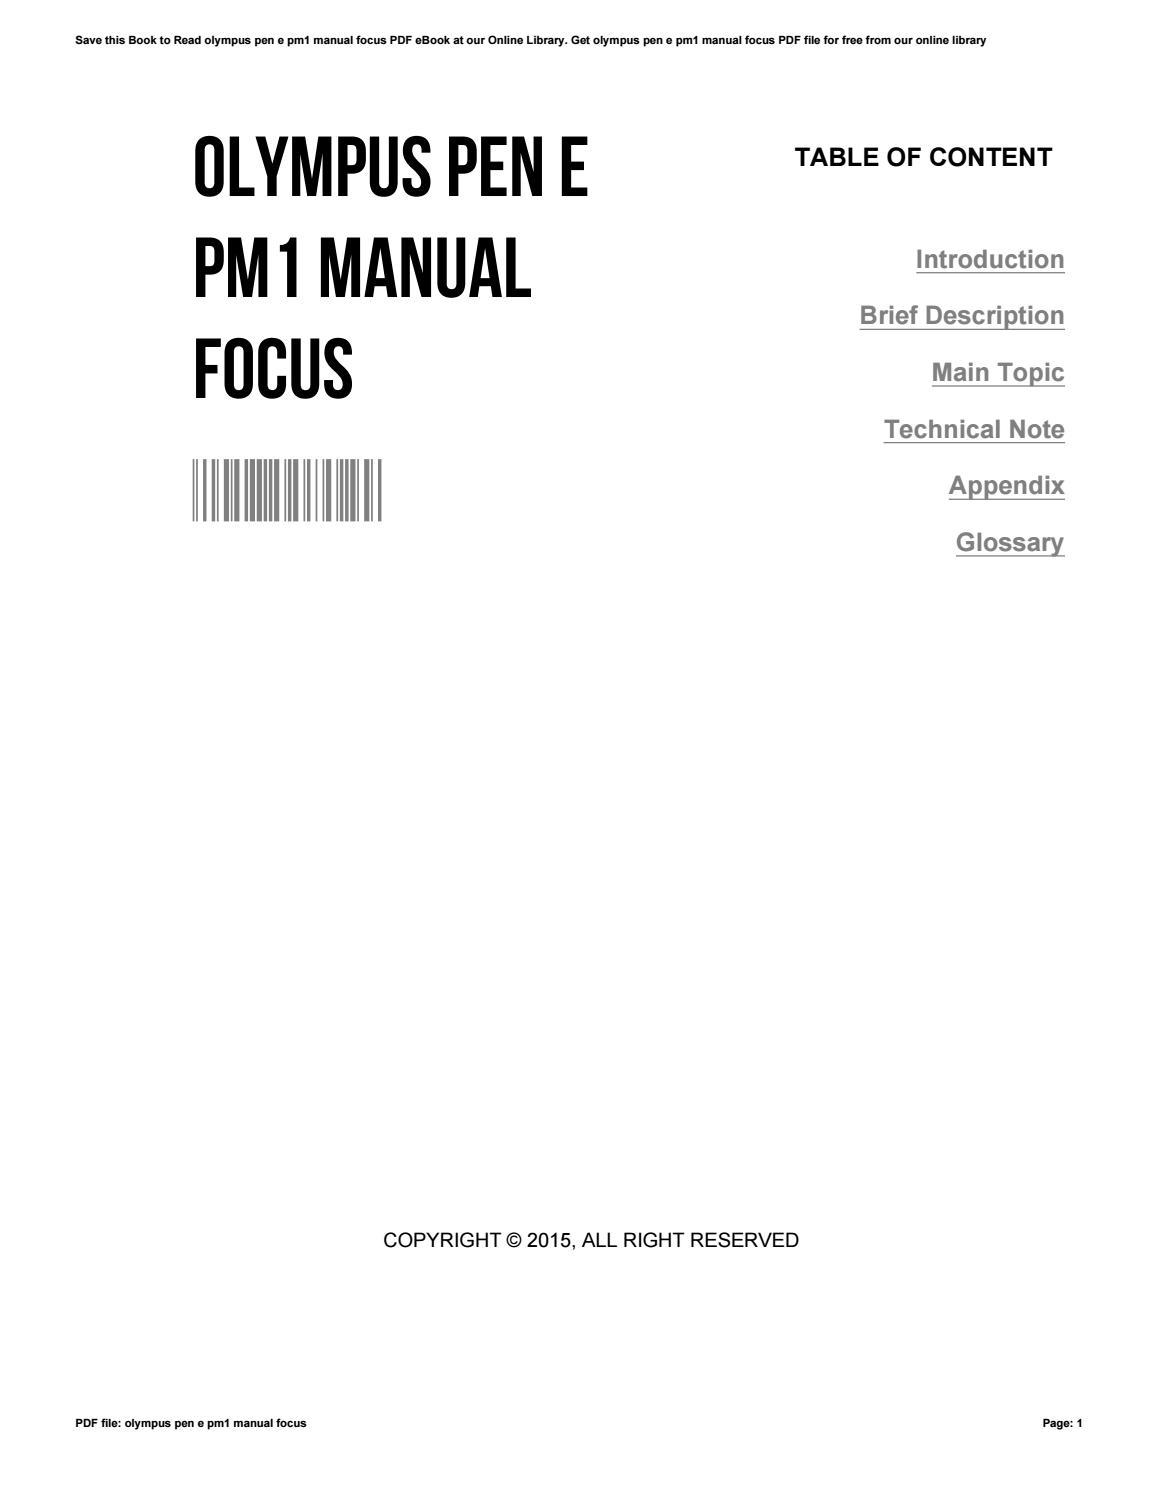 Olympus epm1 manual ebook array olympus pen e pm1 manual focus by johncrawford1752 issuu rh issuu fandeluxe Choice Image